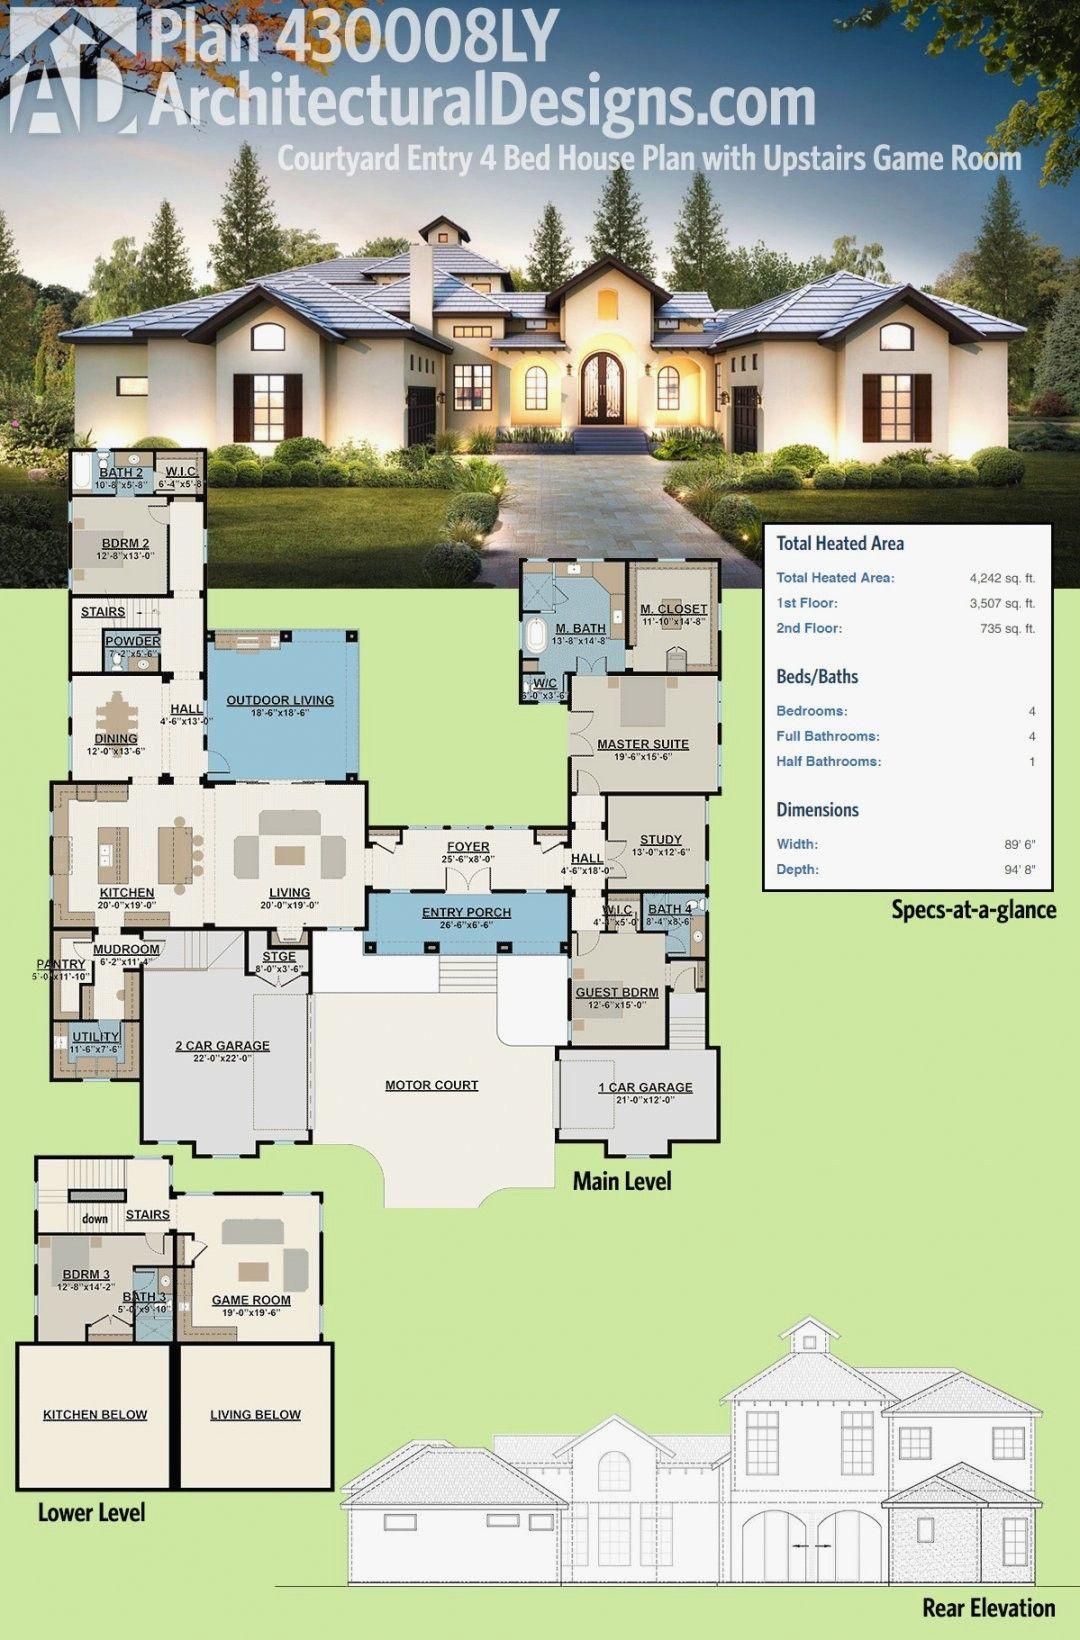 U Shaped House Plans With Courtyard Pool New U Shaped House Design Fresh U Shaped House Plans Pool House Plans Courtyard House Plans Mediterranean House Plans